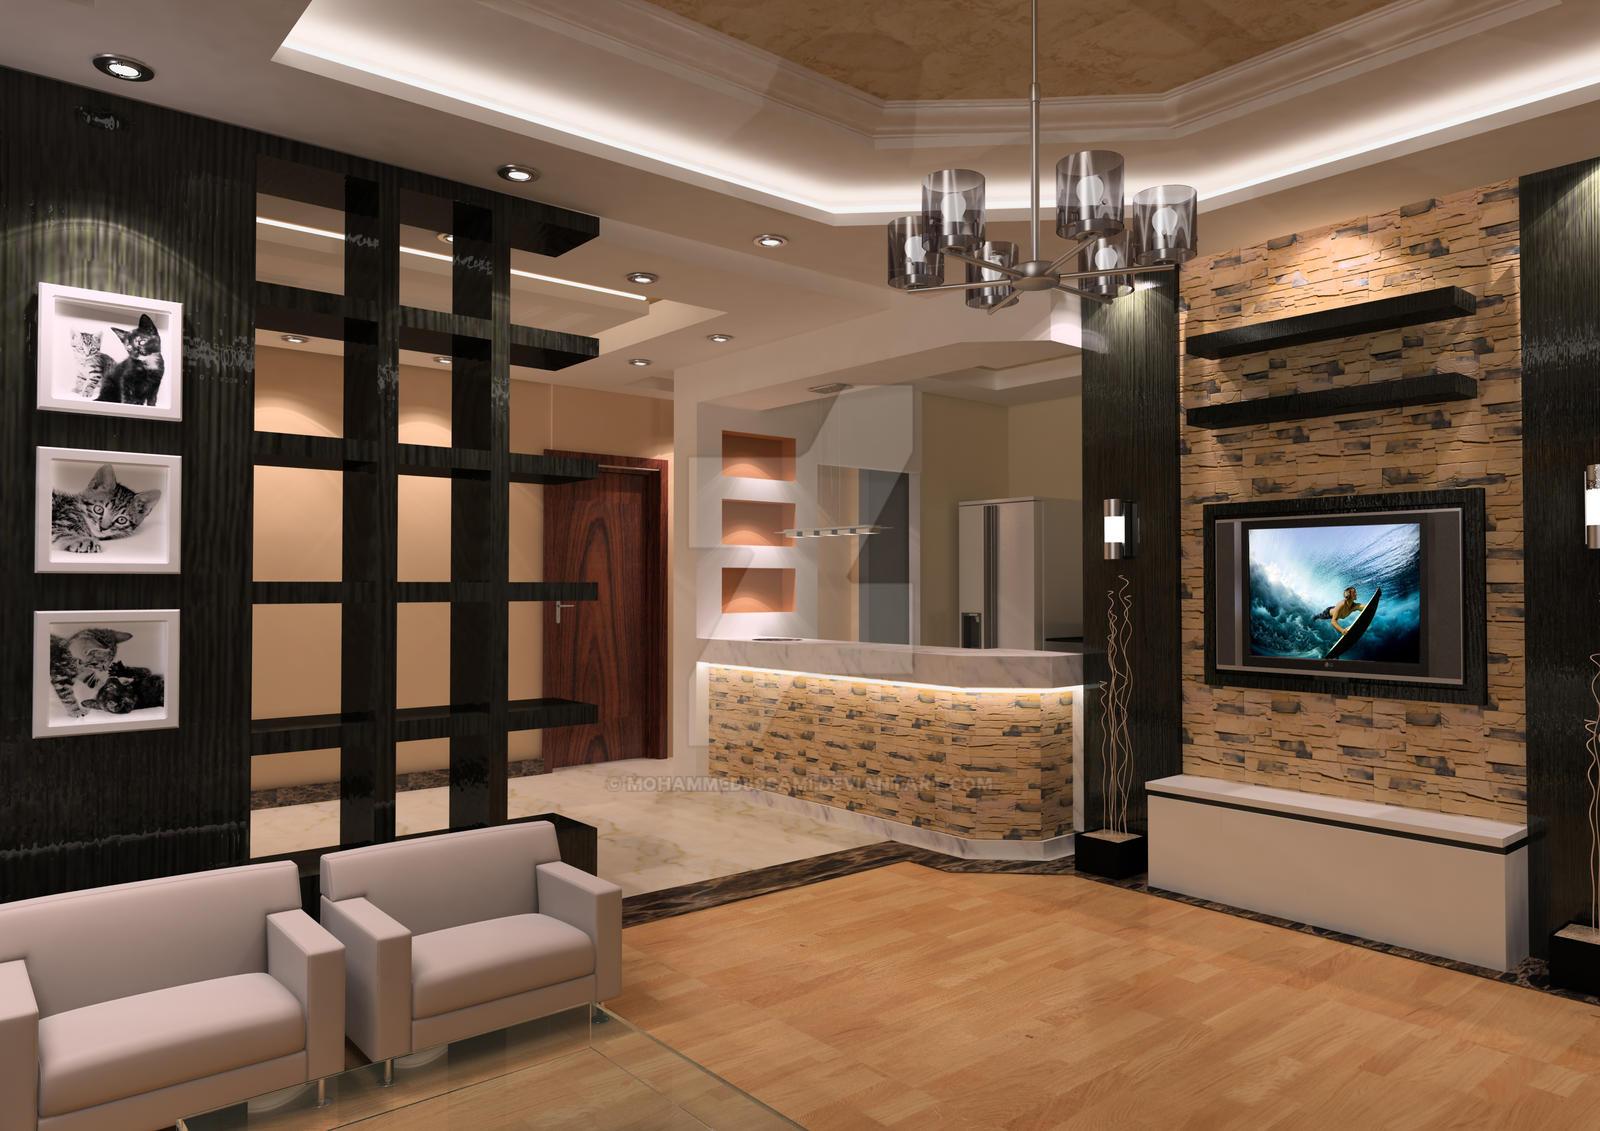 interior house design by mohammed89sami